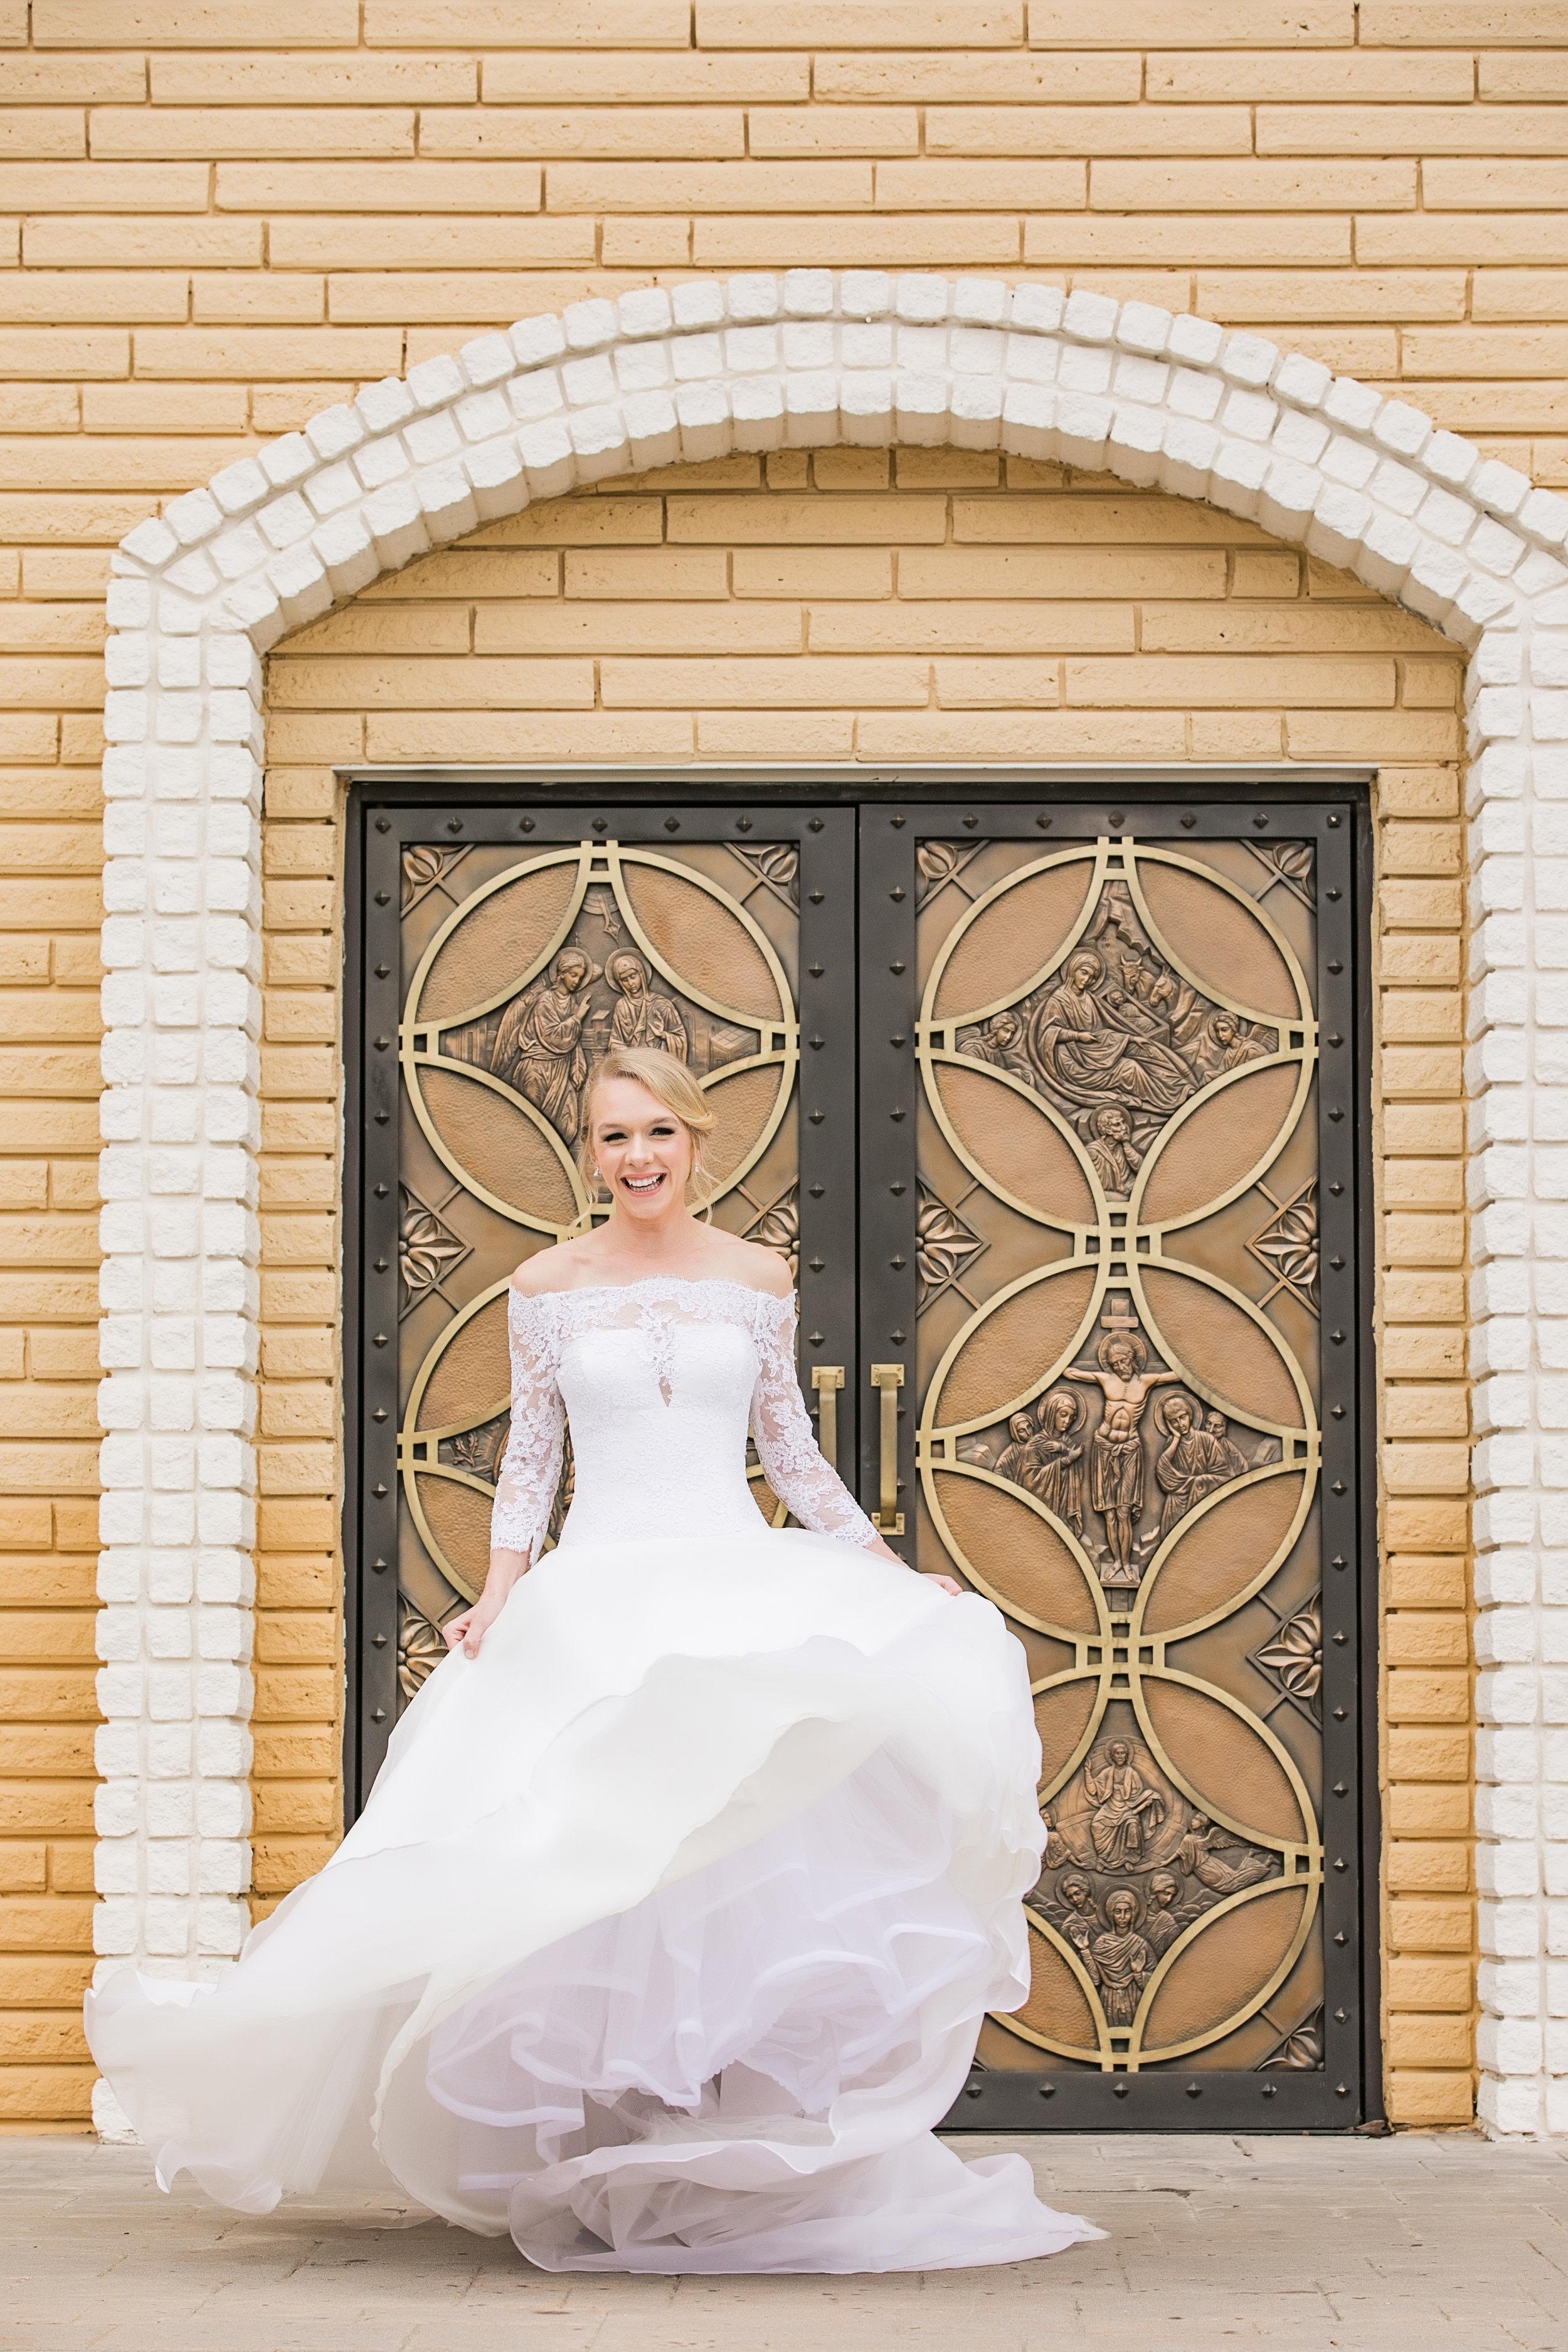 Biltmore Ballrooms Atlanta Wedding Planner Slauer Events Bridal Portraits 93.jpg